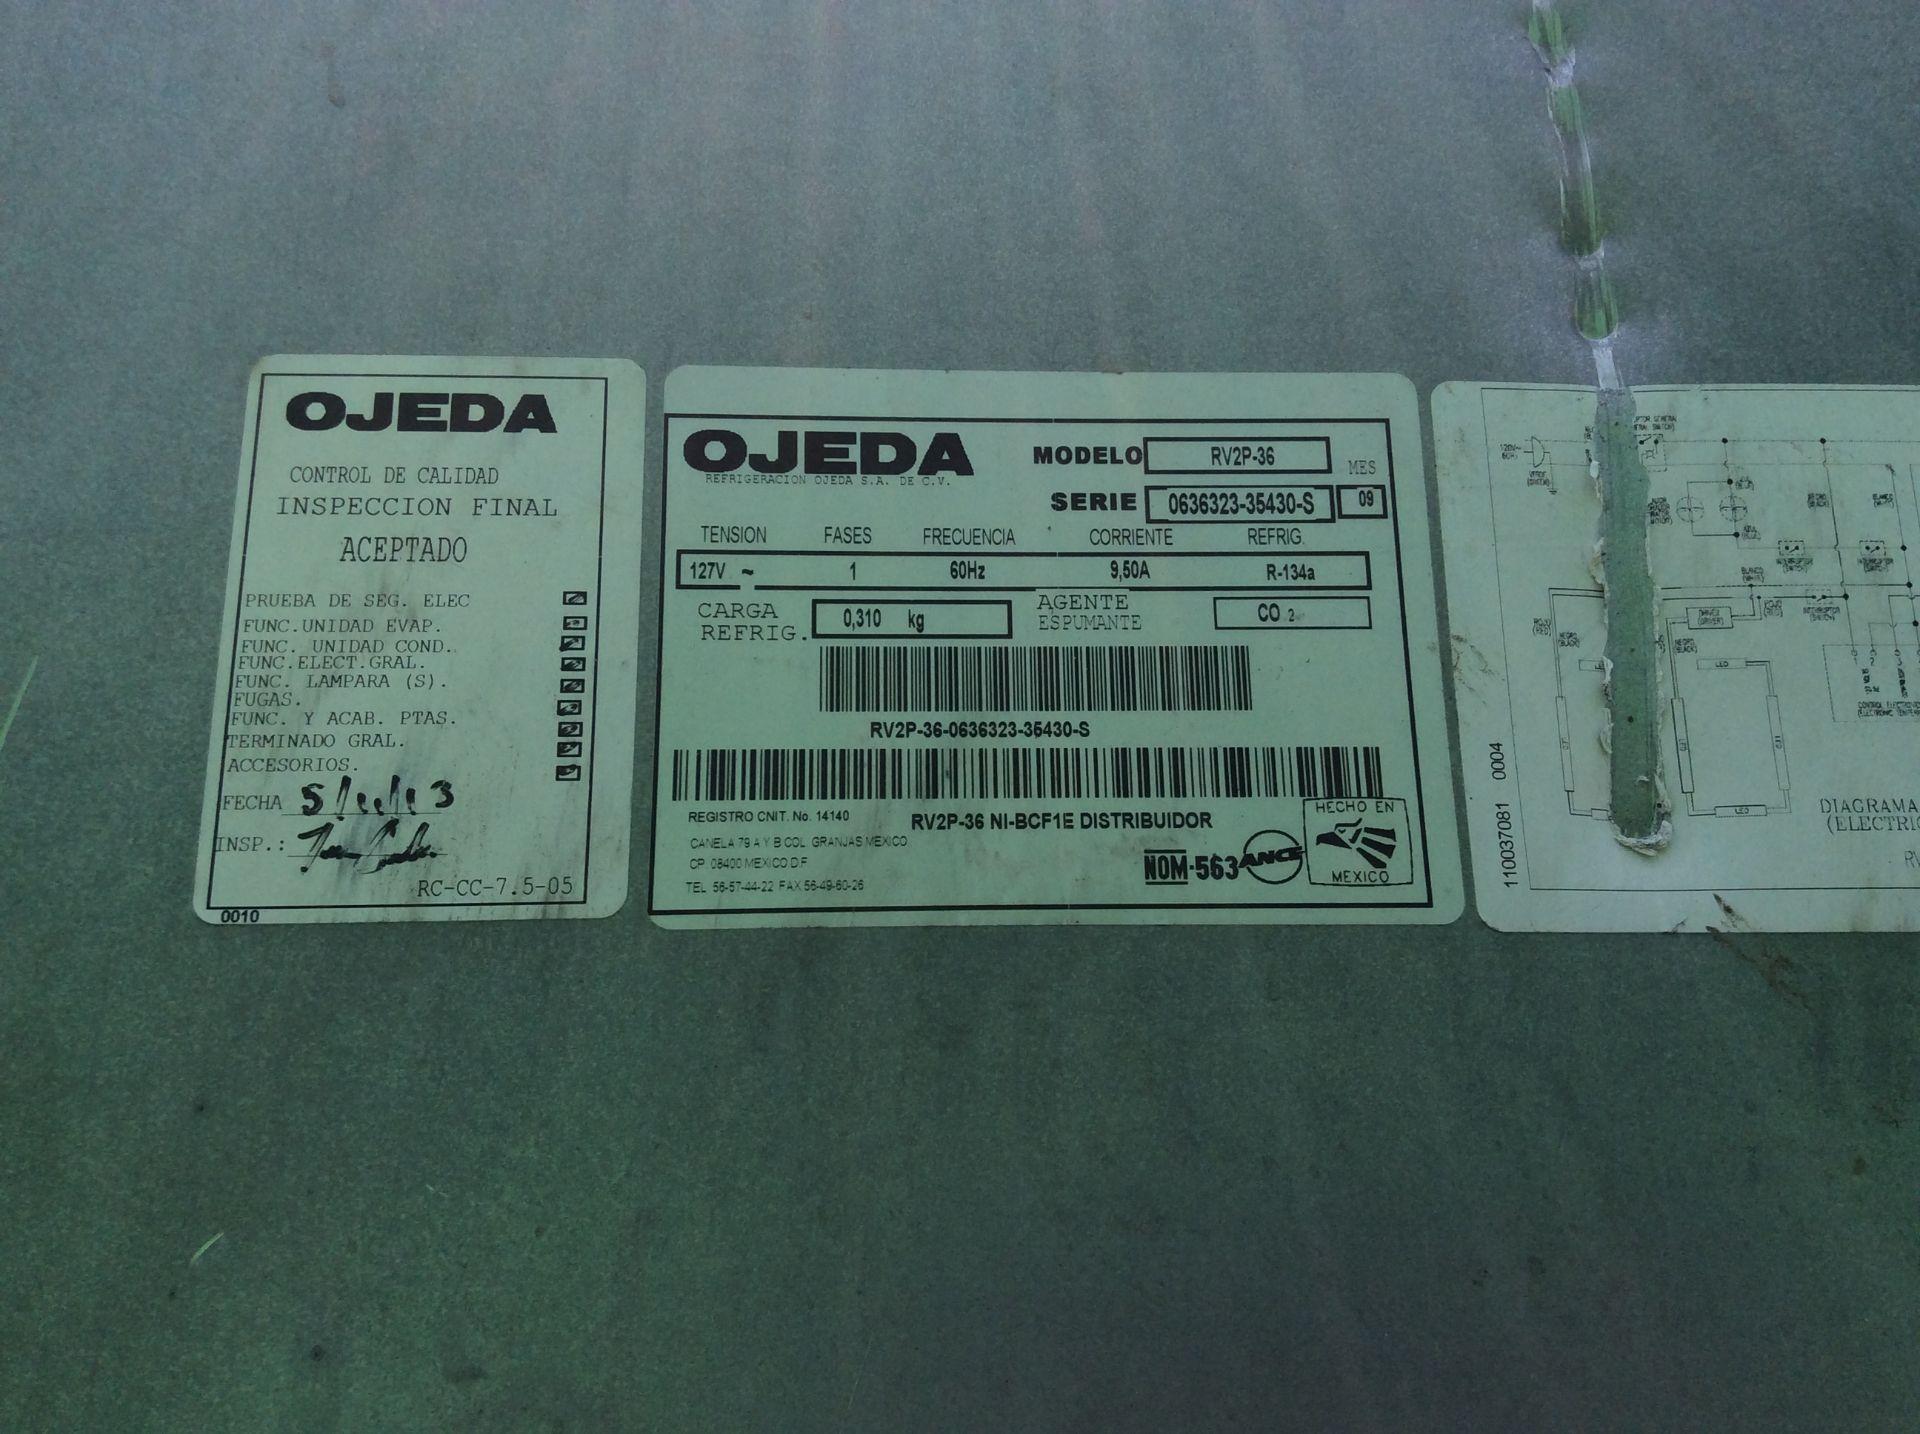 1 Ojeda refrigerator of double glass door model RV2P36 serial number 0636323-34305 120V - Image 5 of 14